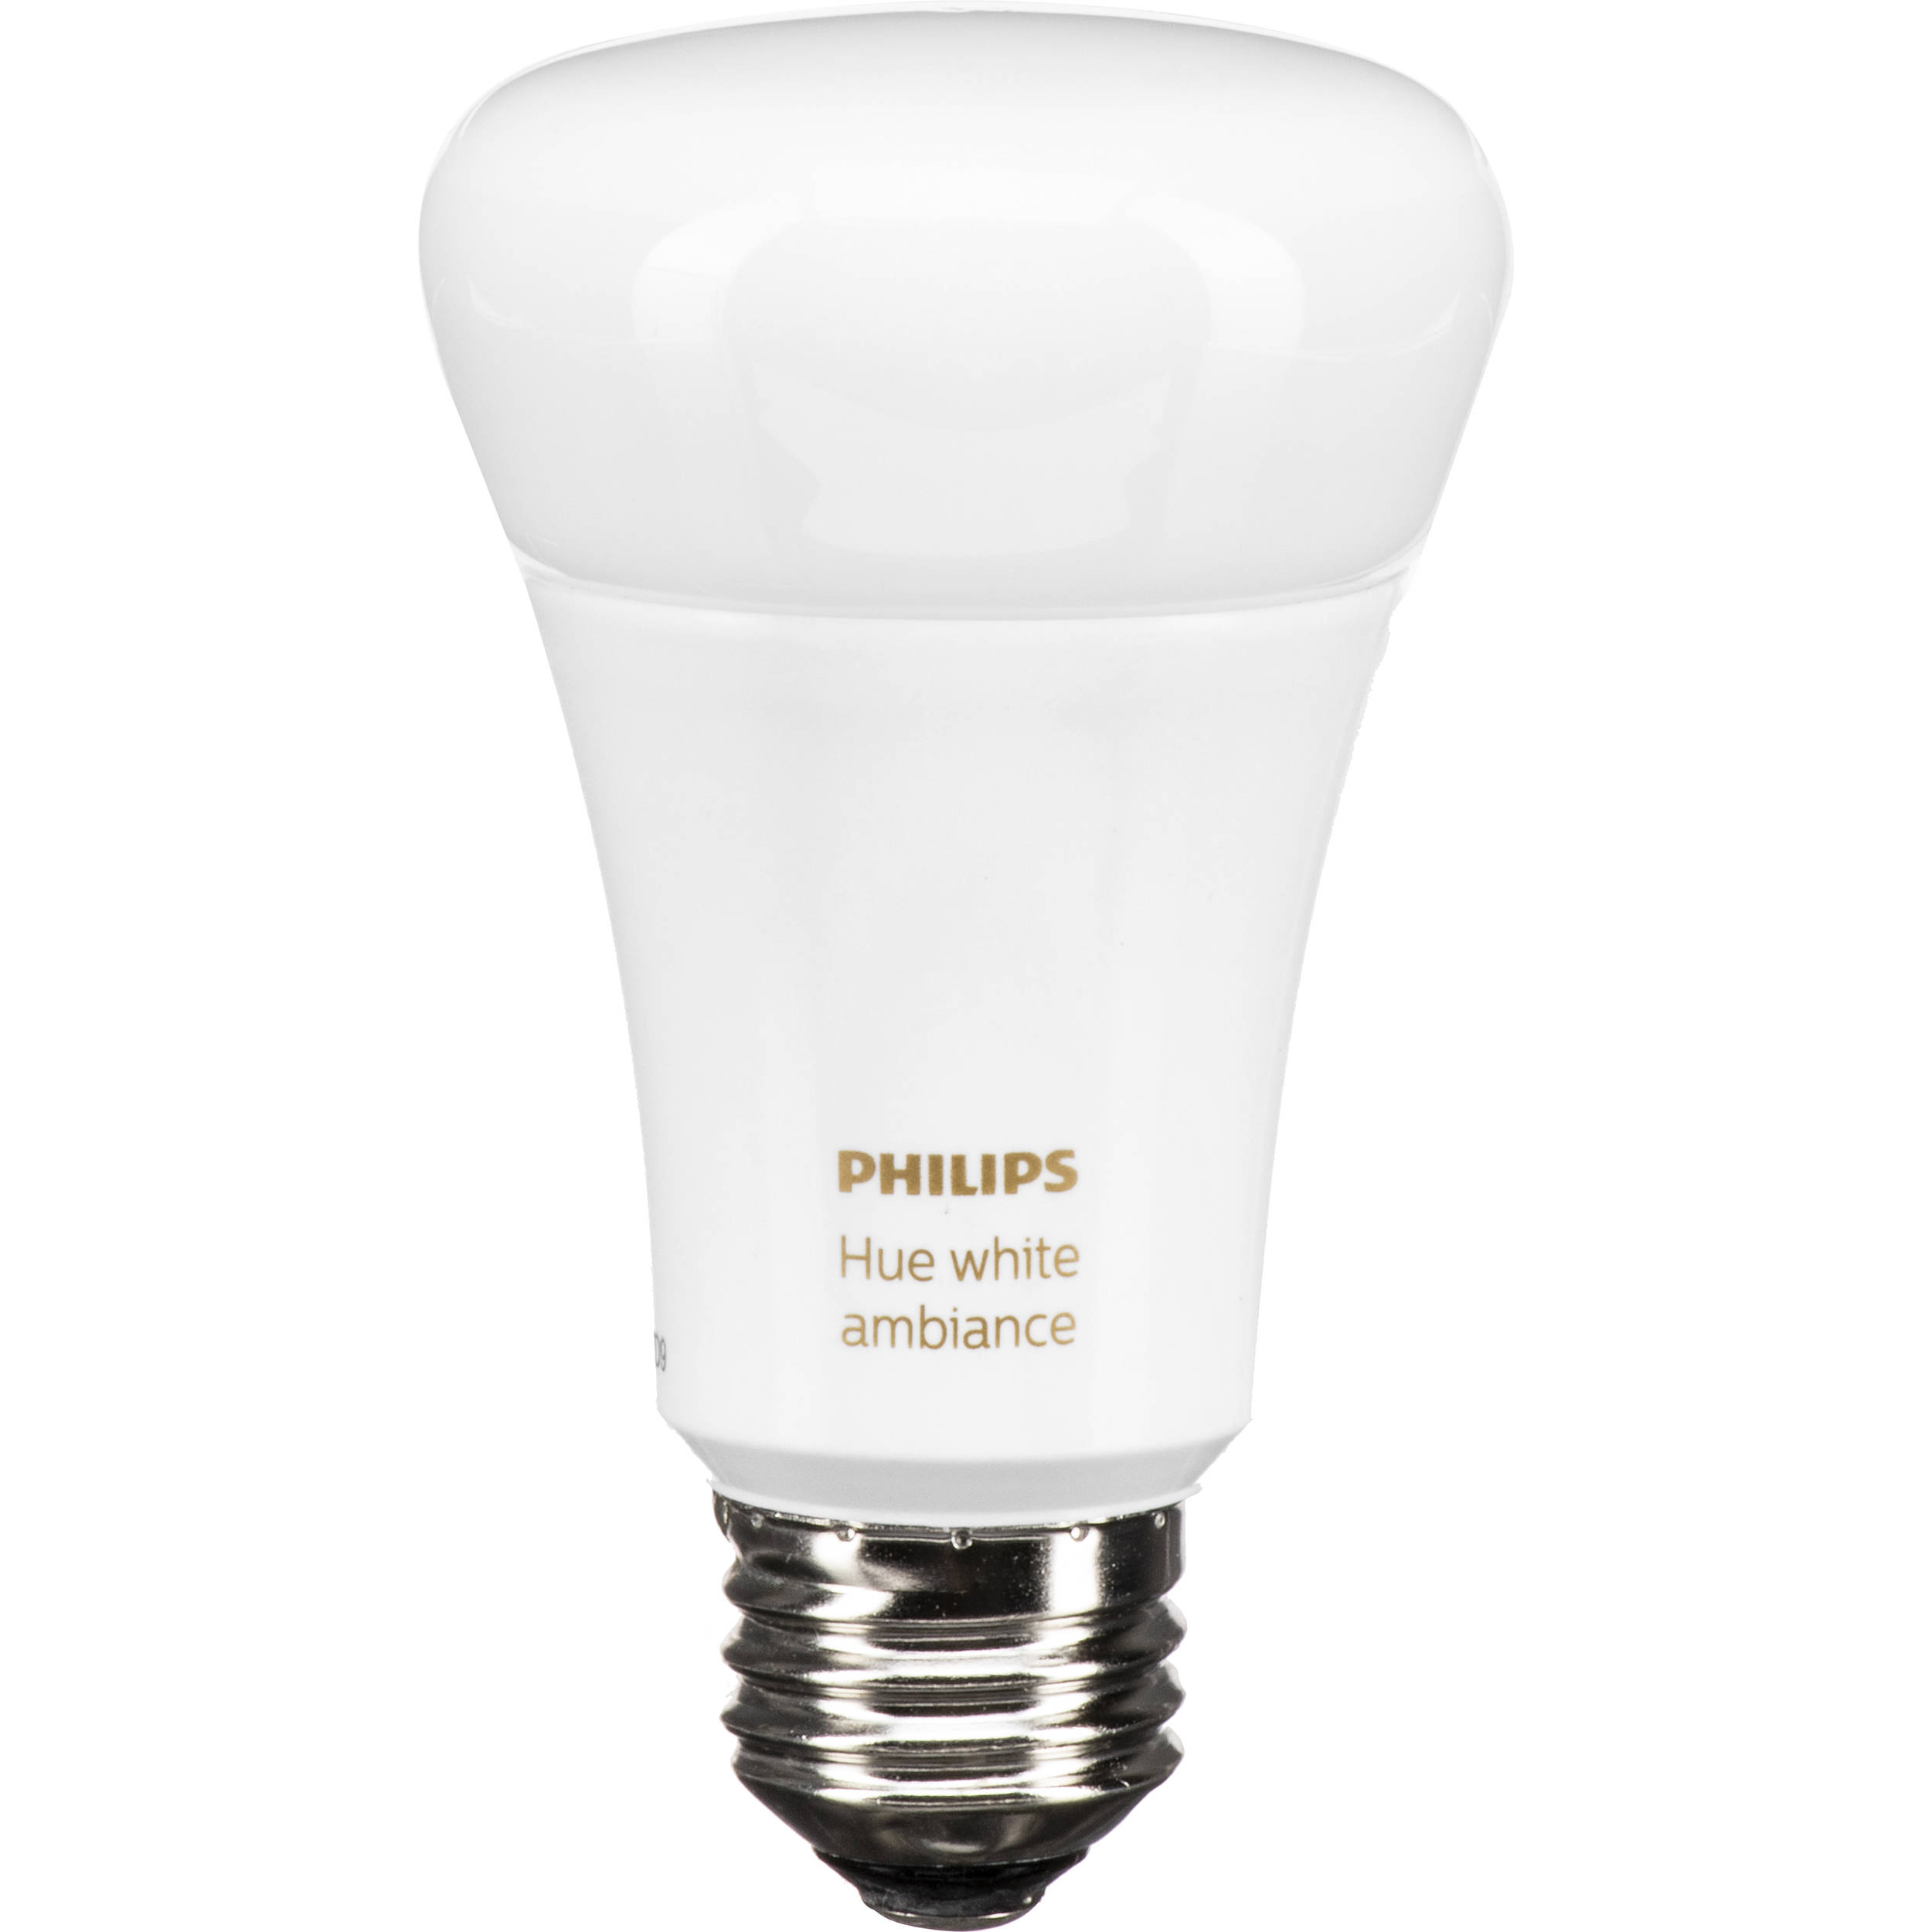 philips hue a19 single bulb ambiance 461004 b h photo video. Black Bedroom Furniture Sets. Home Design Ideas